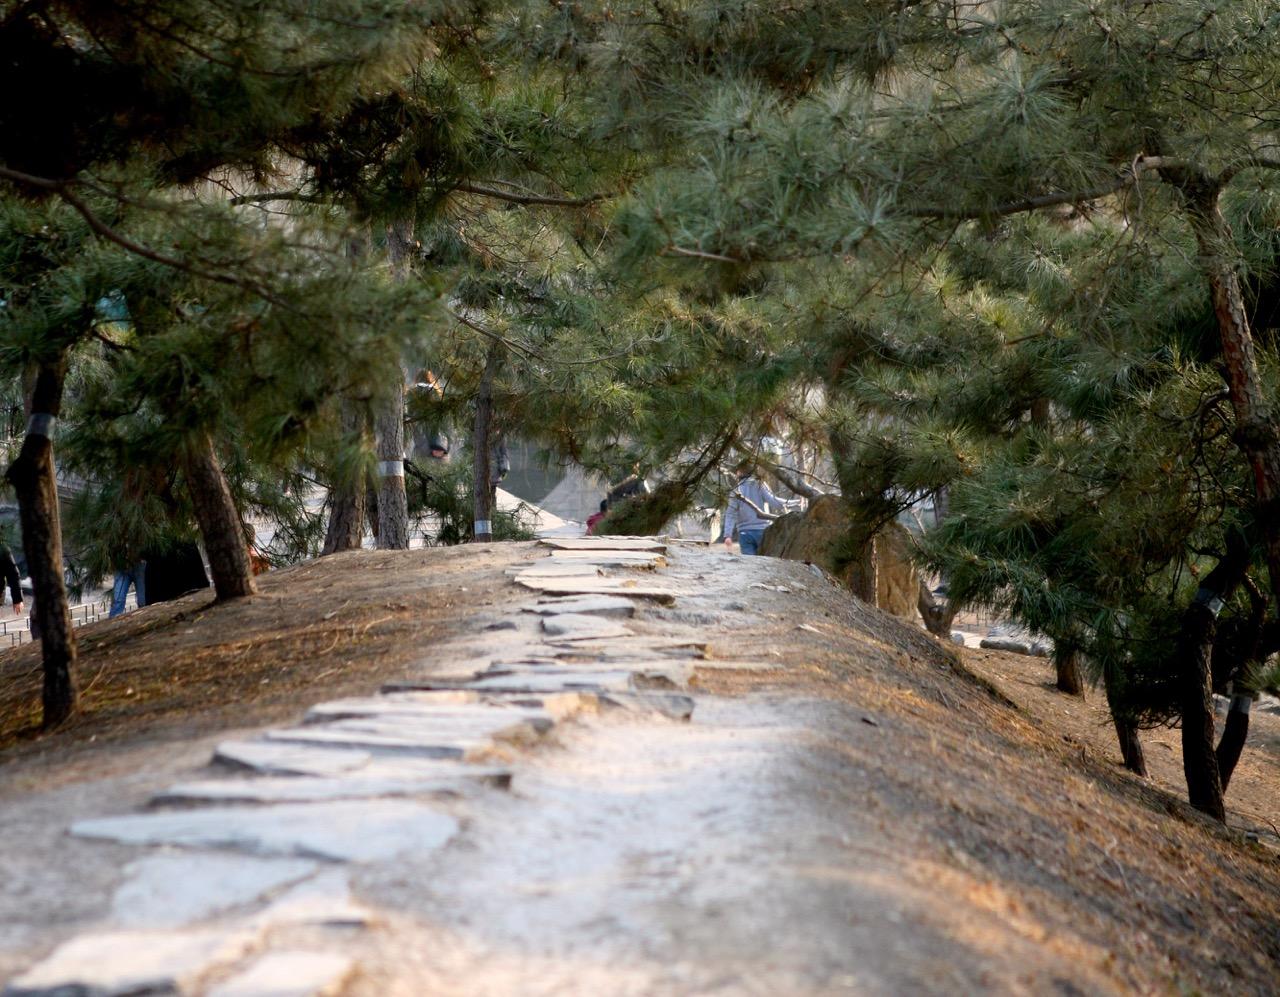 thegoodgarden|oldsummerpalace|china|davidcalle|2484.jpg